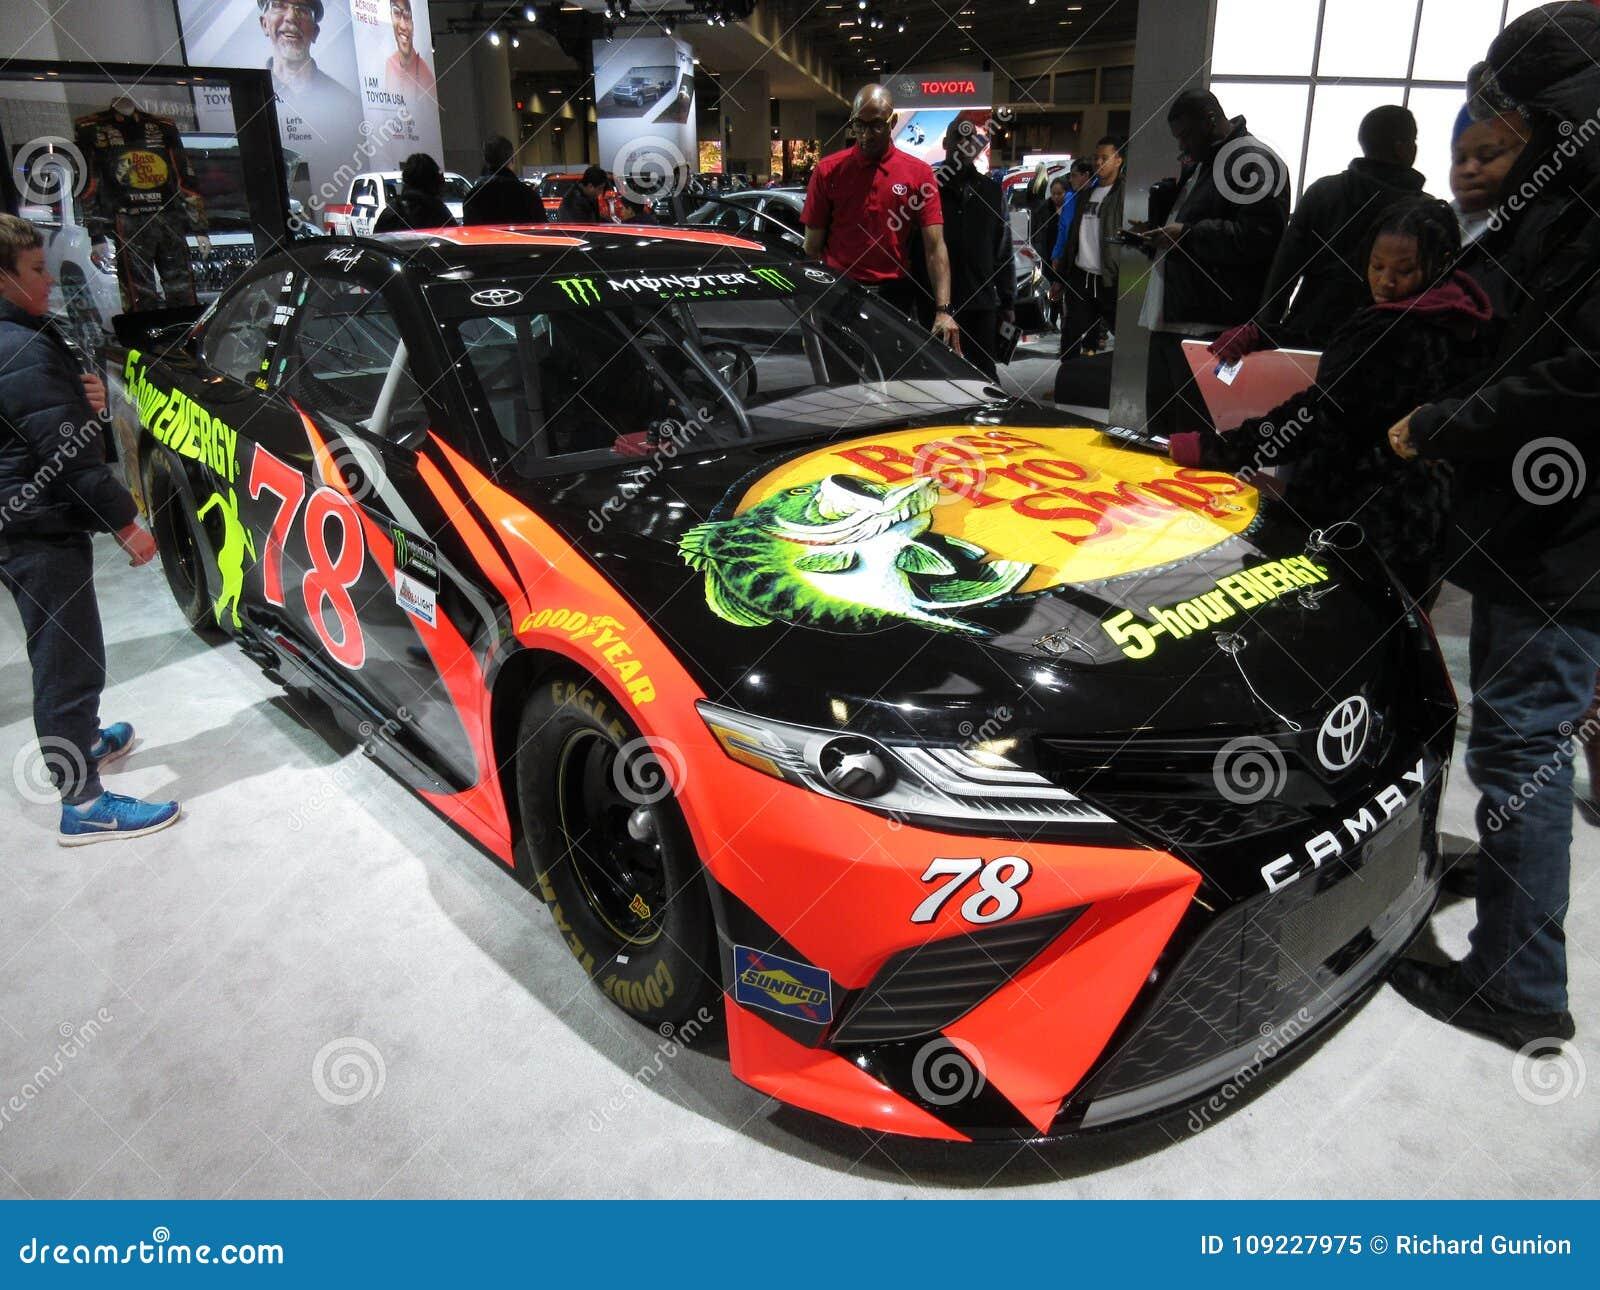 Bass Pro Shops Racing Camry Editorial Image Image Of Show Stock - Bass pro car show